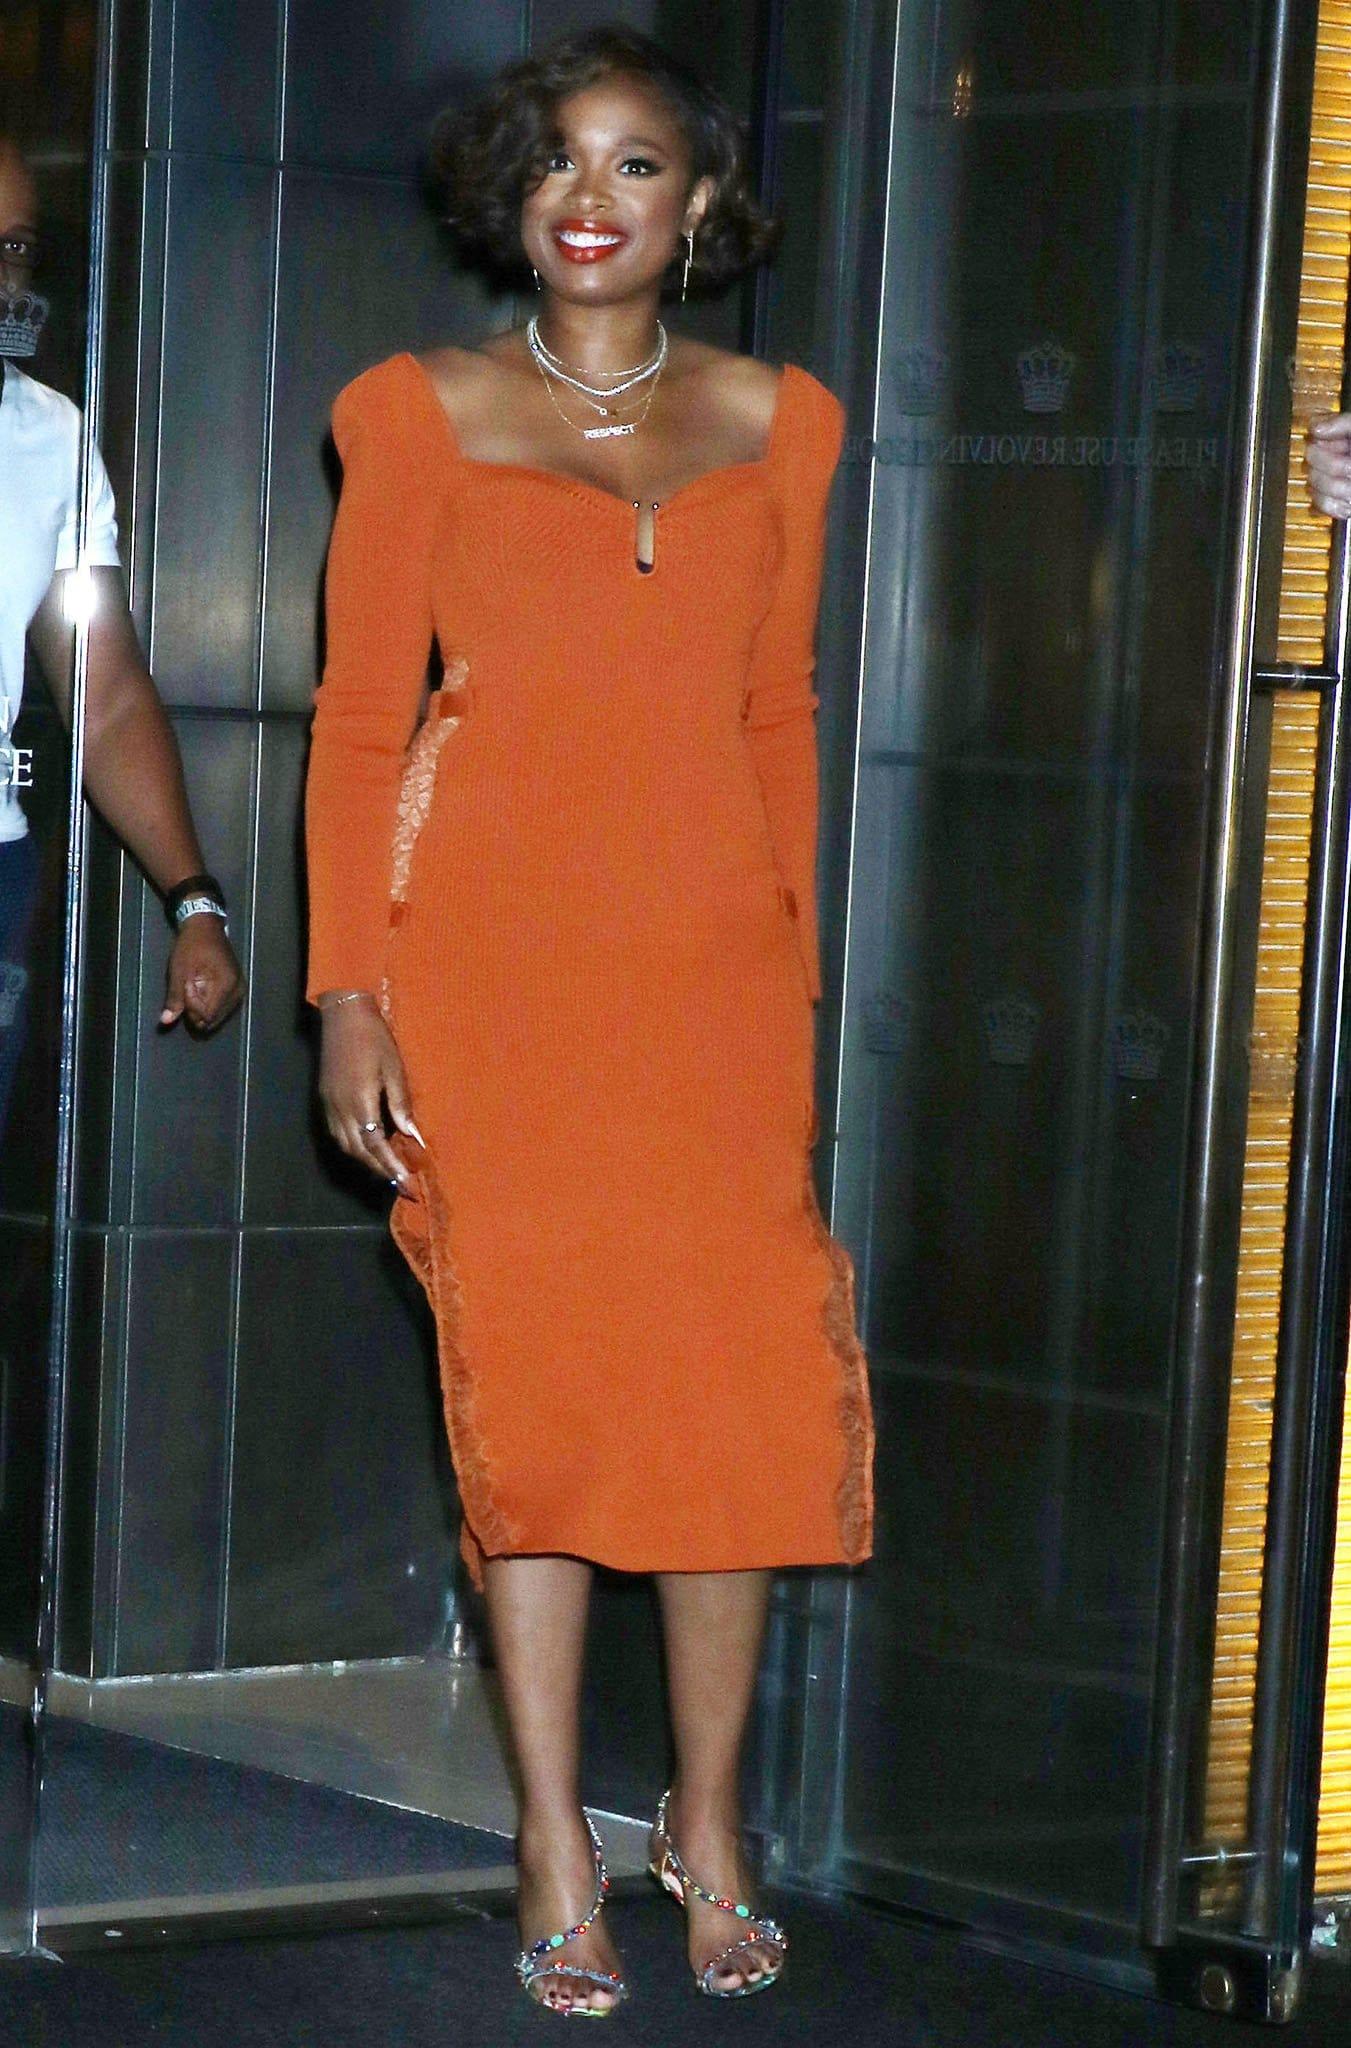 Jennifer Hudson leaving her NYC hotel in an orange ribbed midi dress on August 12, 2021